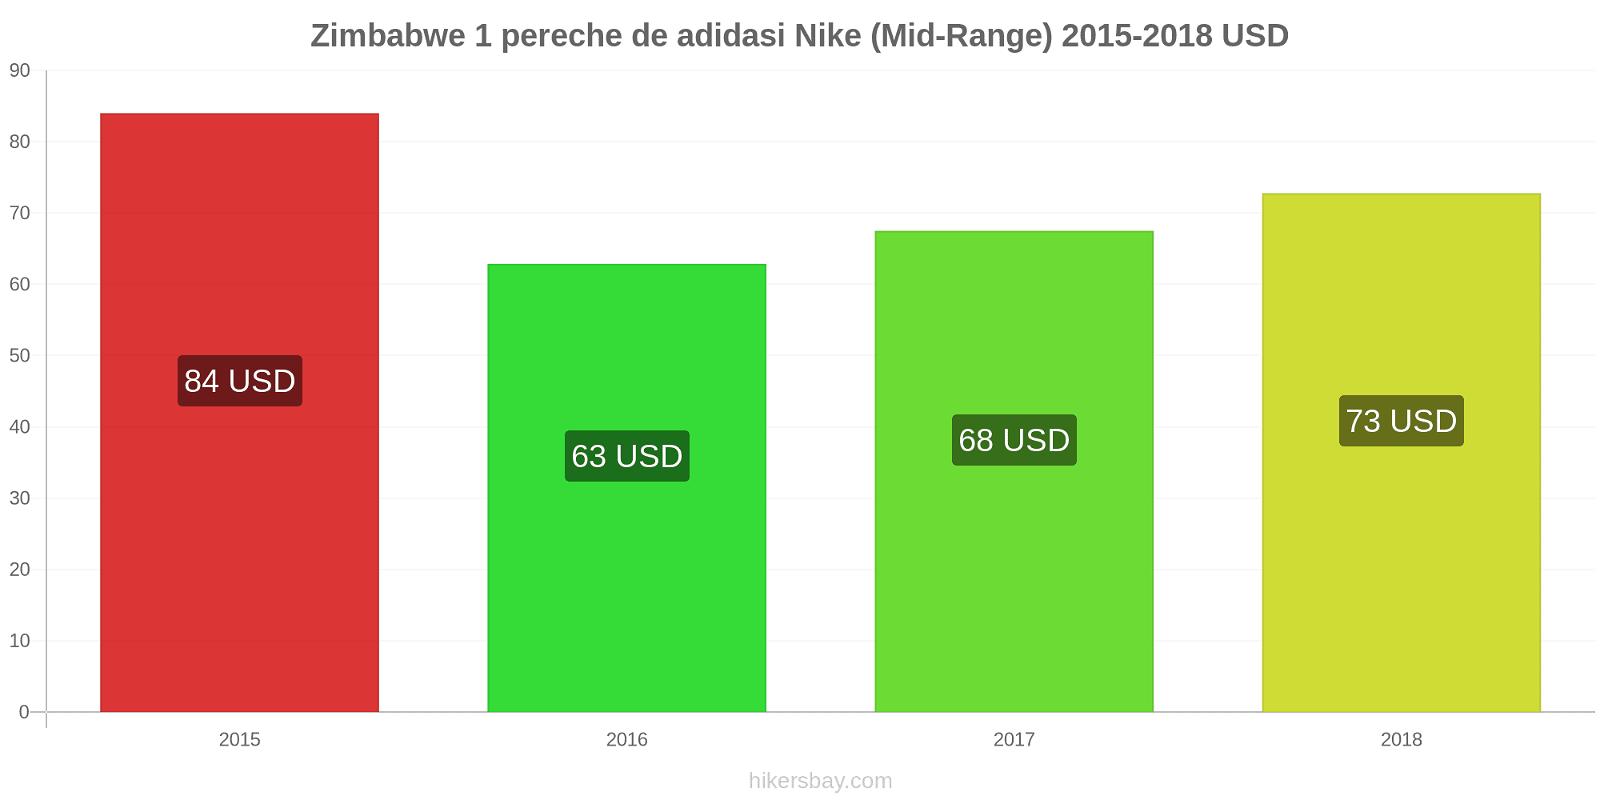 Zimbabwe modificări de preț 1 pereche de adidasi Nike (Mid-Range) hikersbay.com